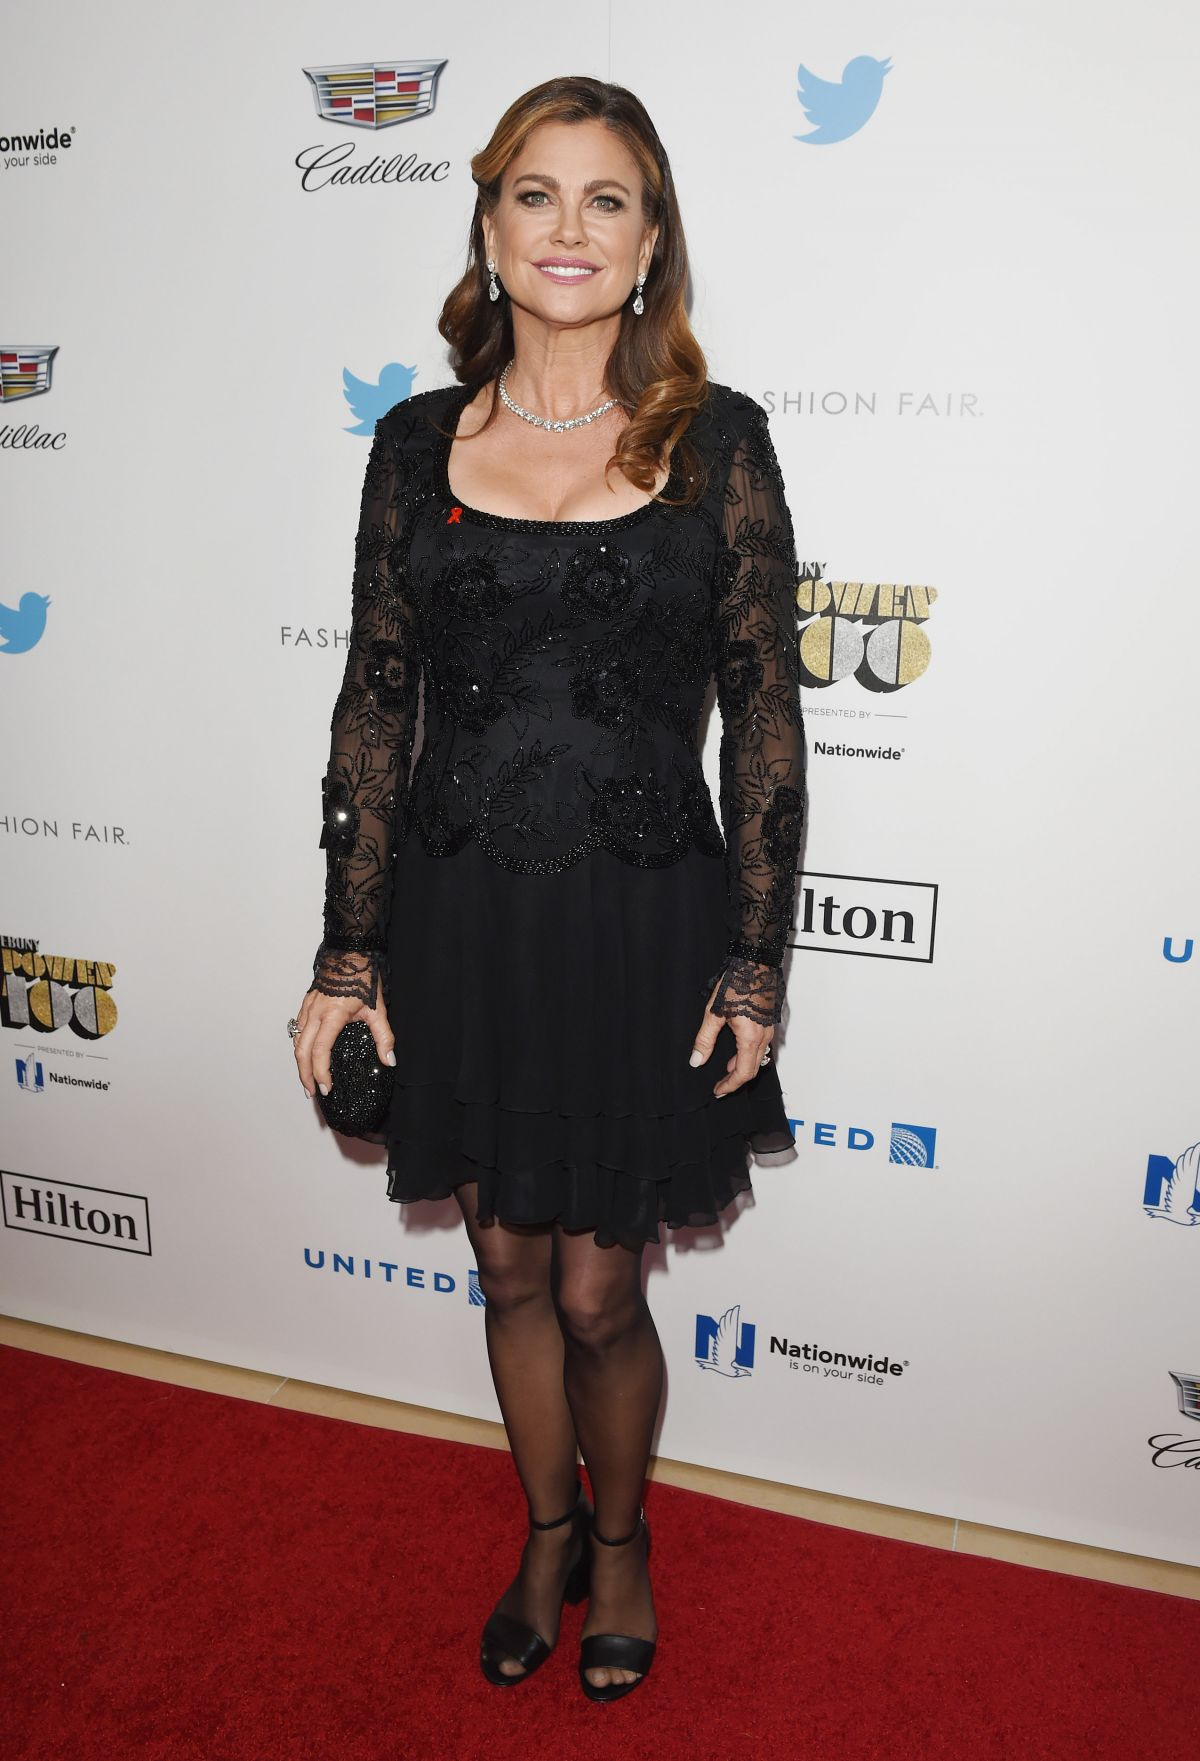 KATHY IRELAND at Ebony Power 100 Gala in Beverly Hills 12/01/2016